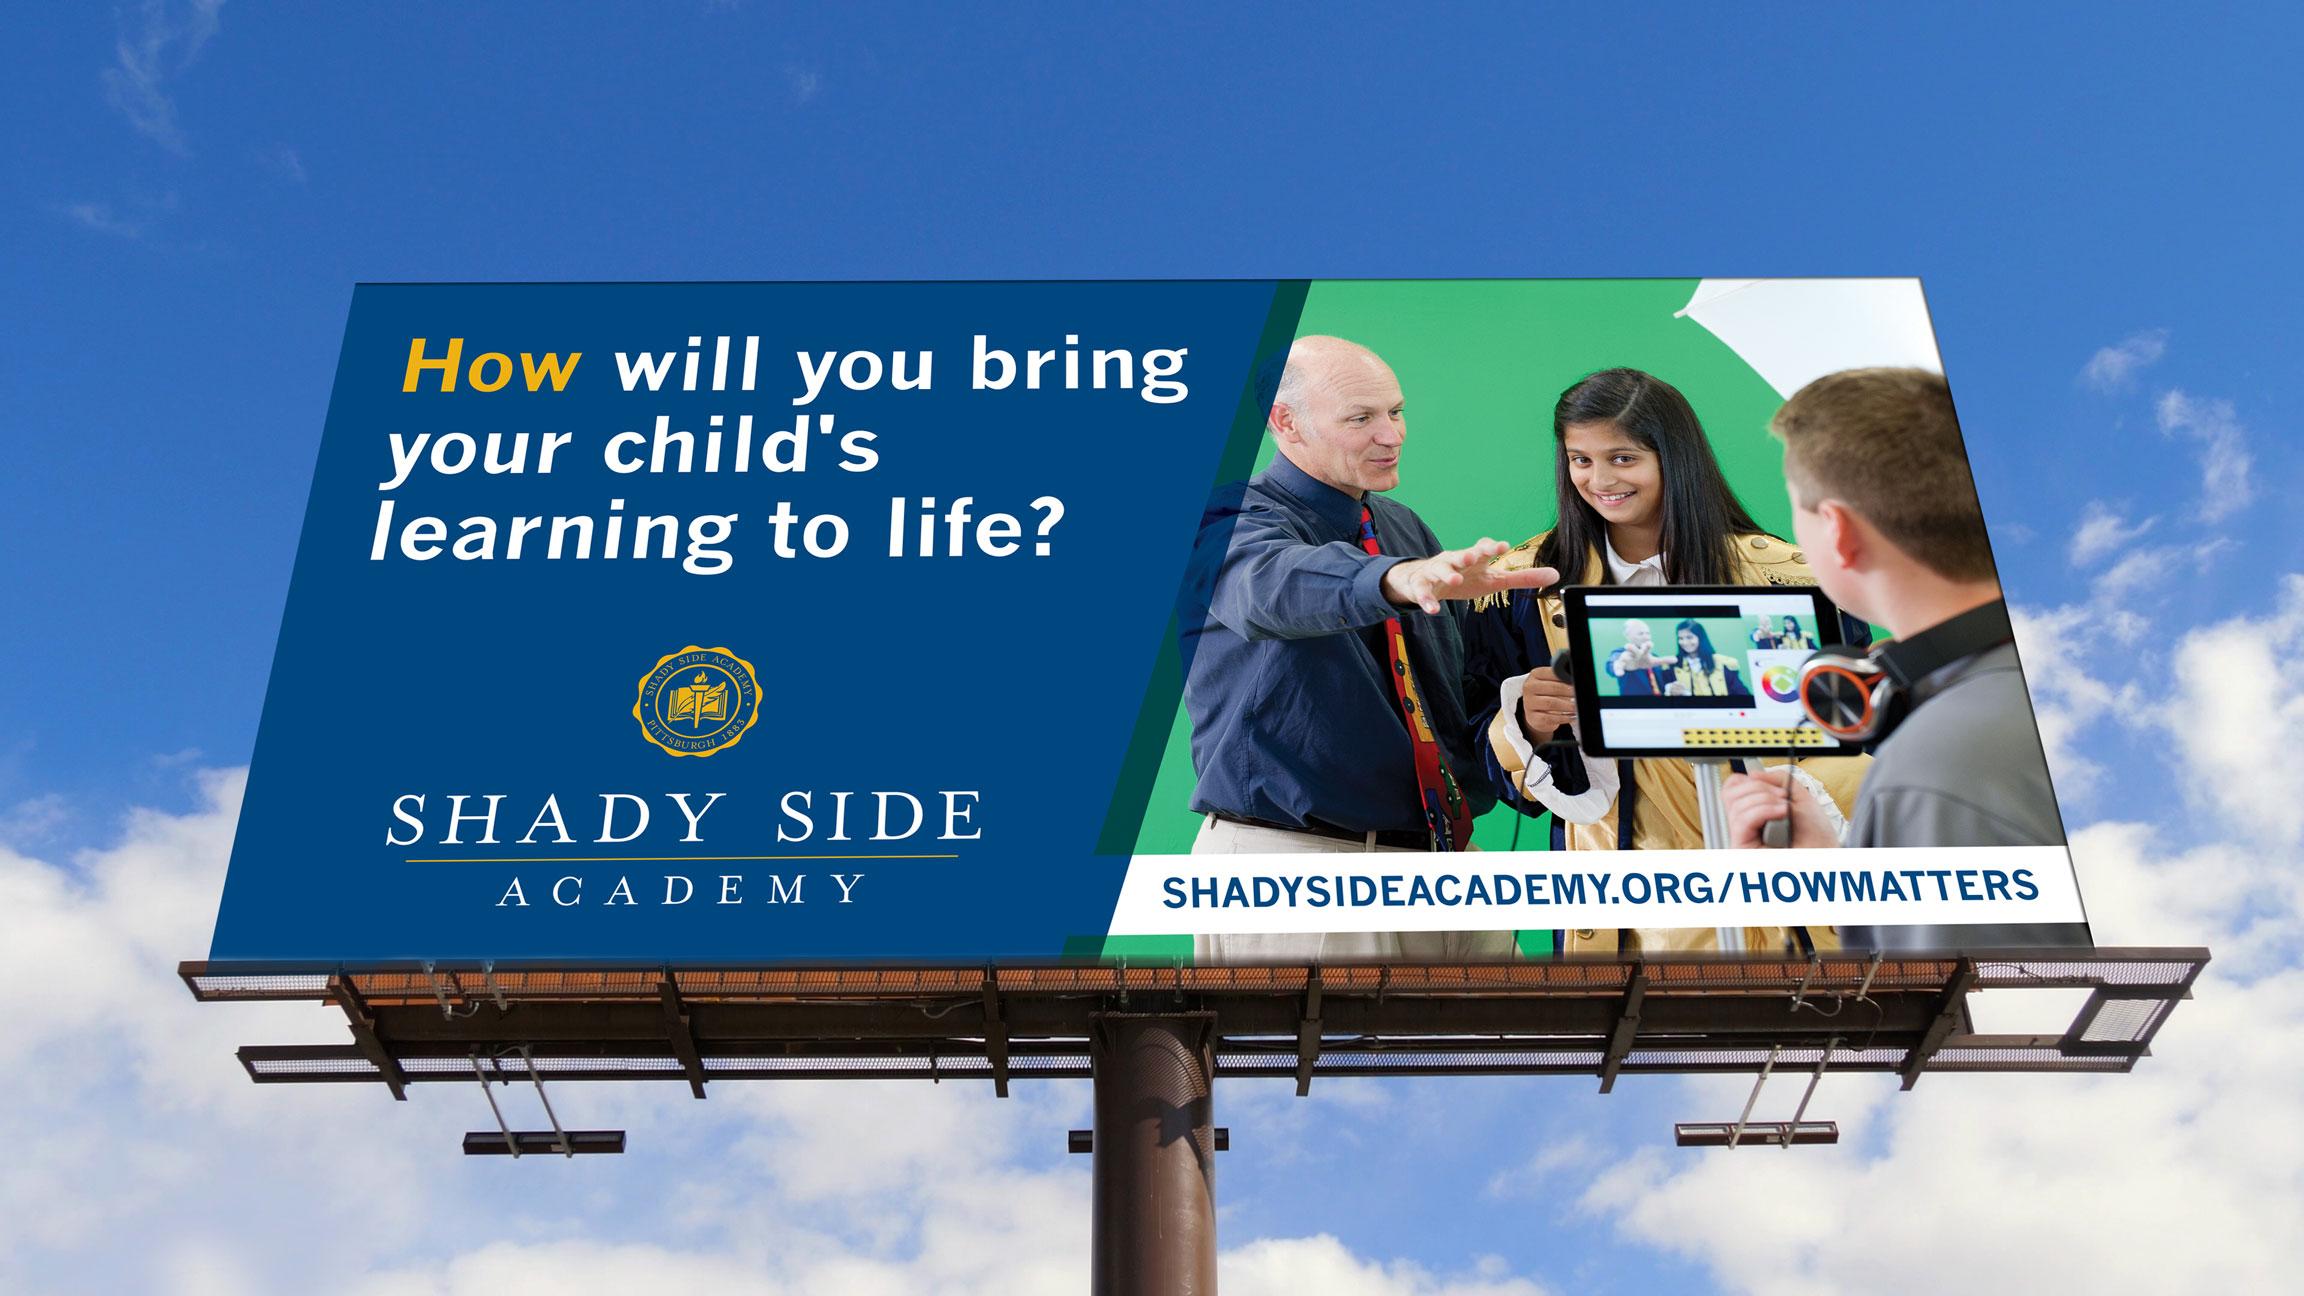 Shady-Side-Academy-Creosote-Affects-Billboard.jpg